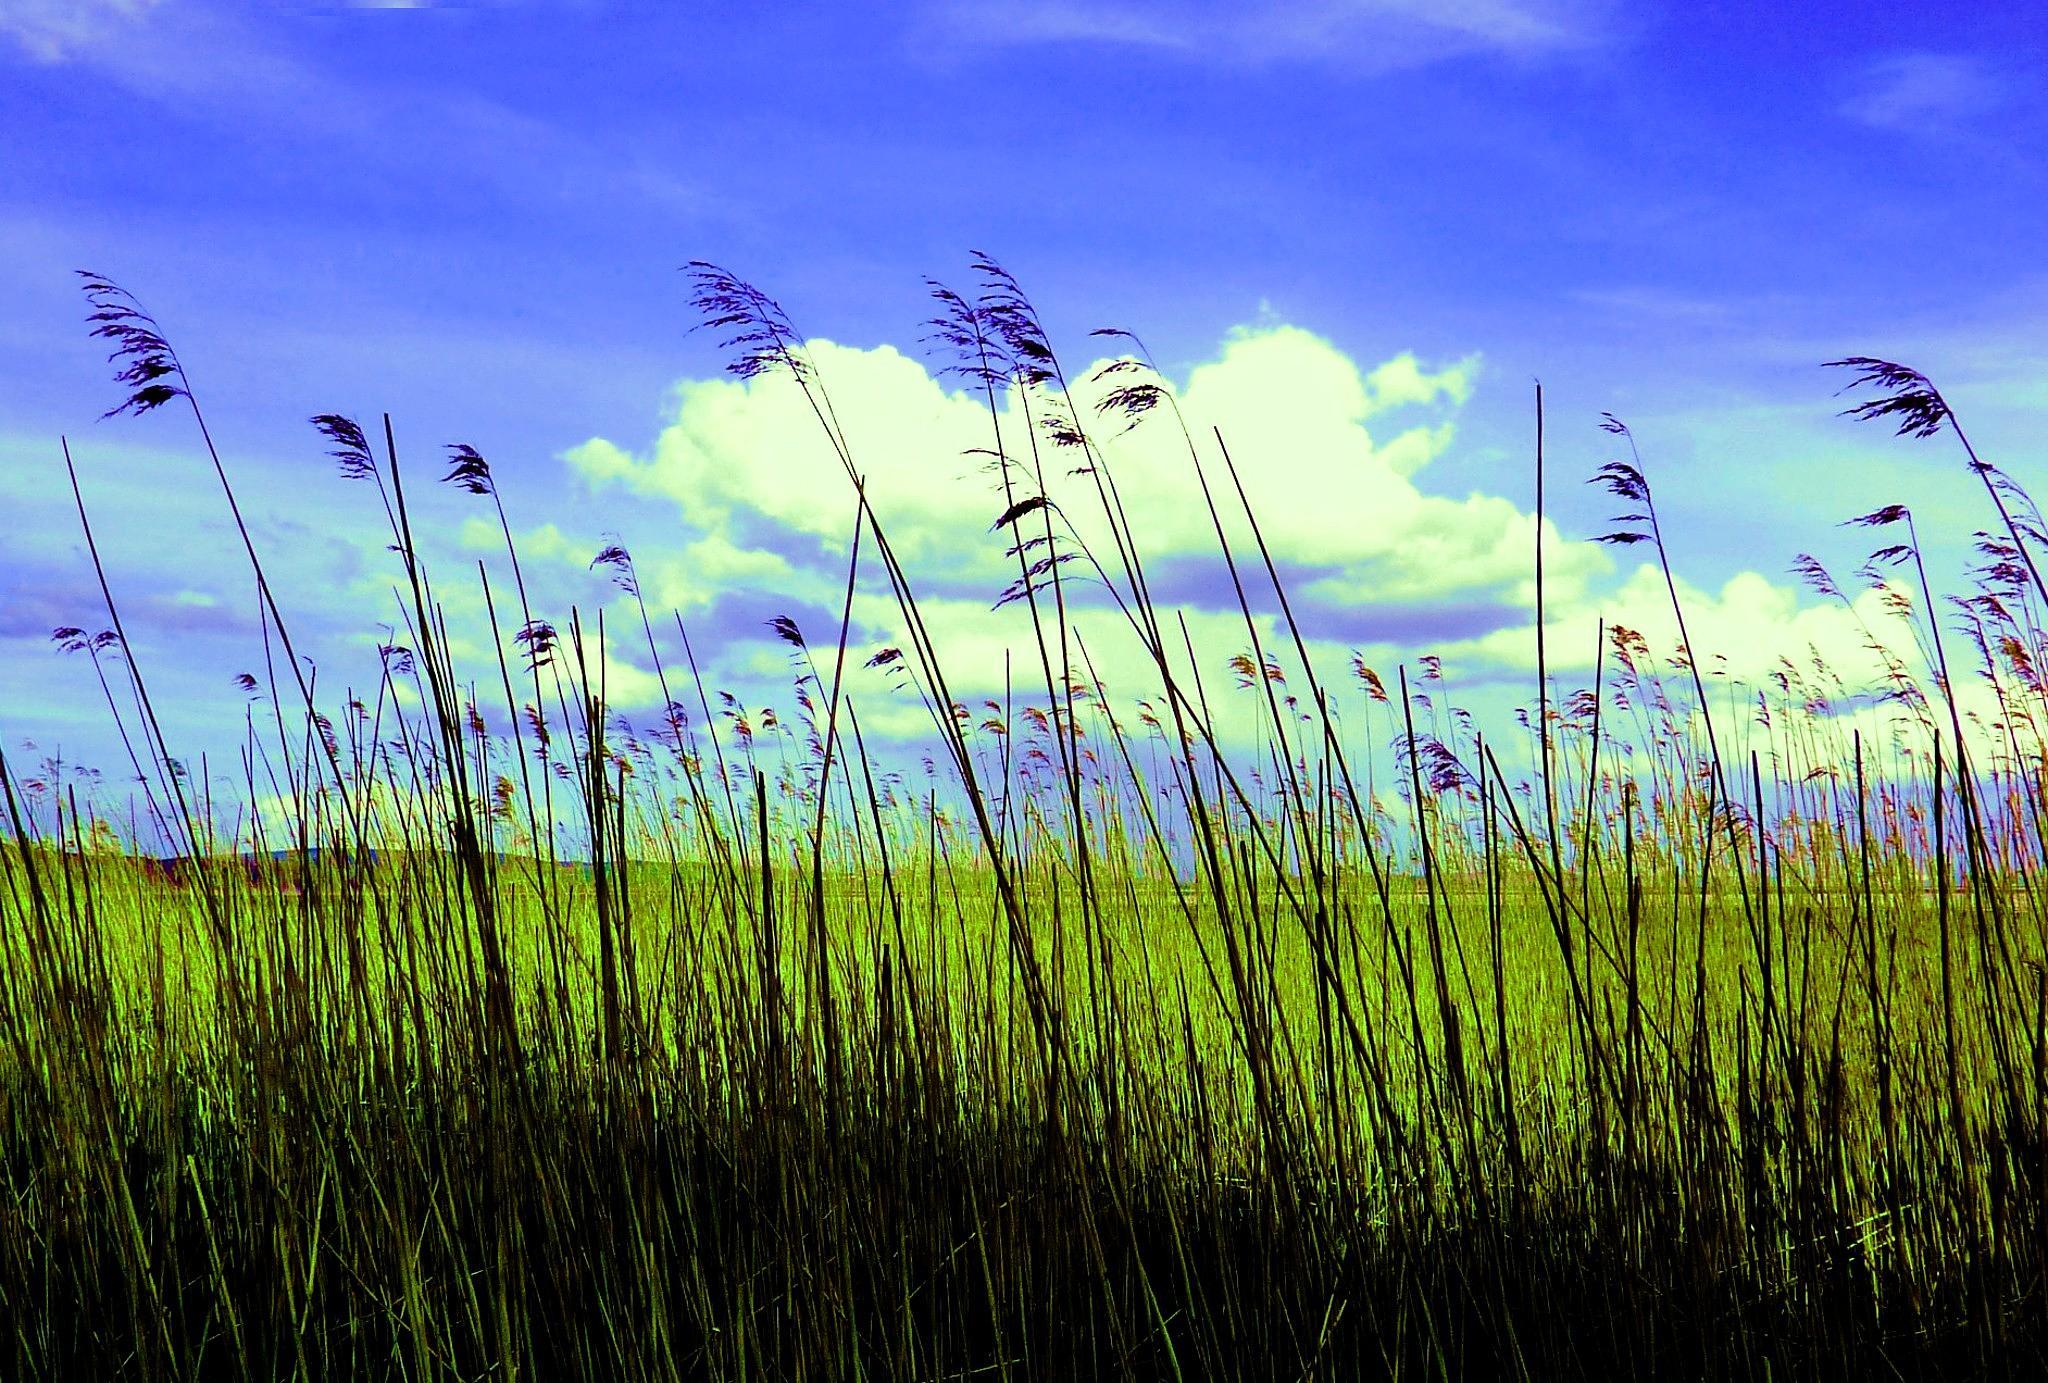 Summertime by cheryl.ferrarkirkham